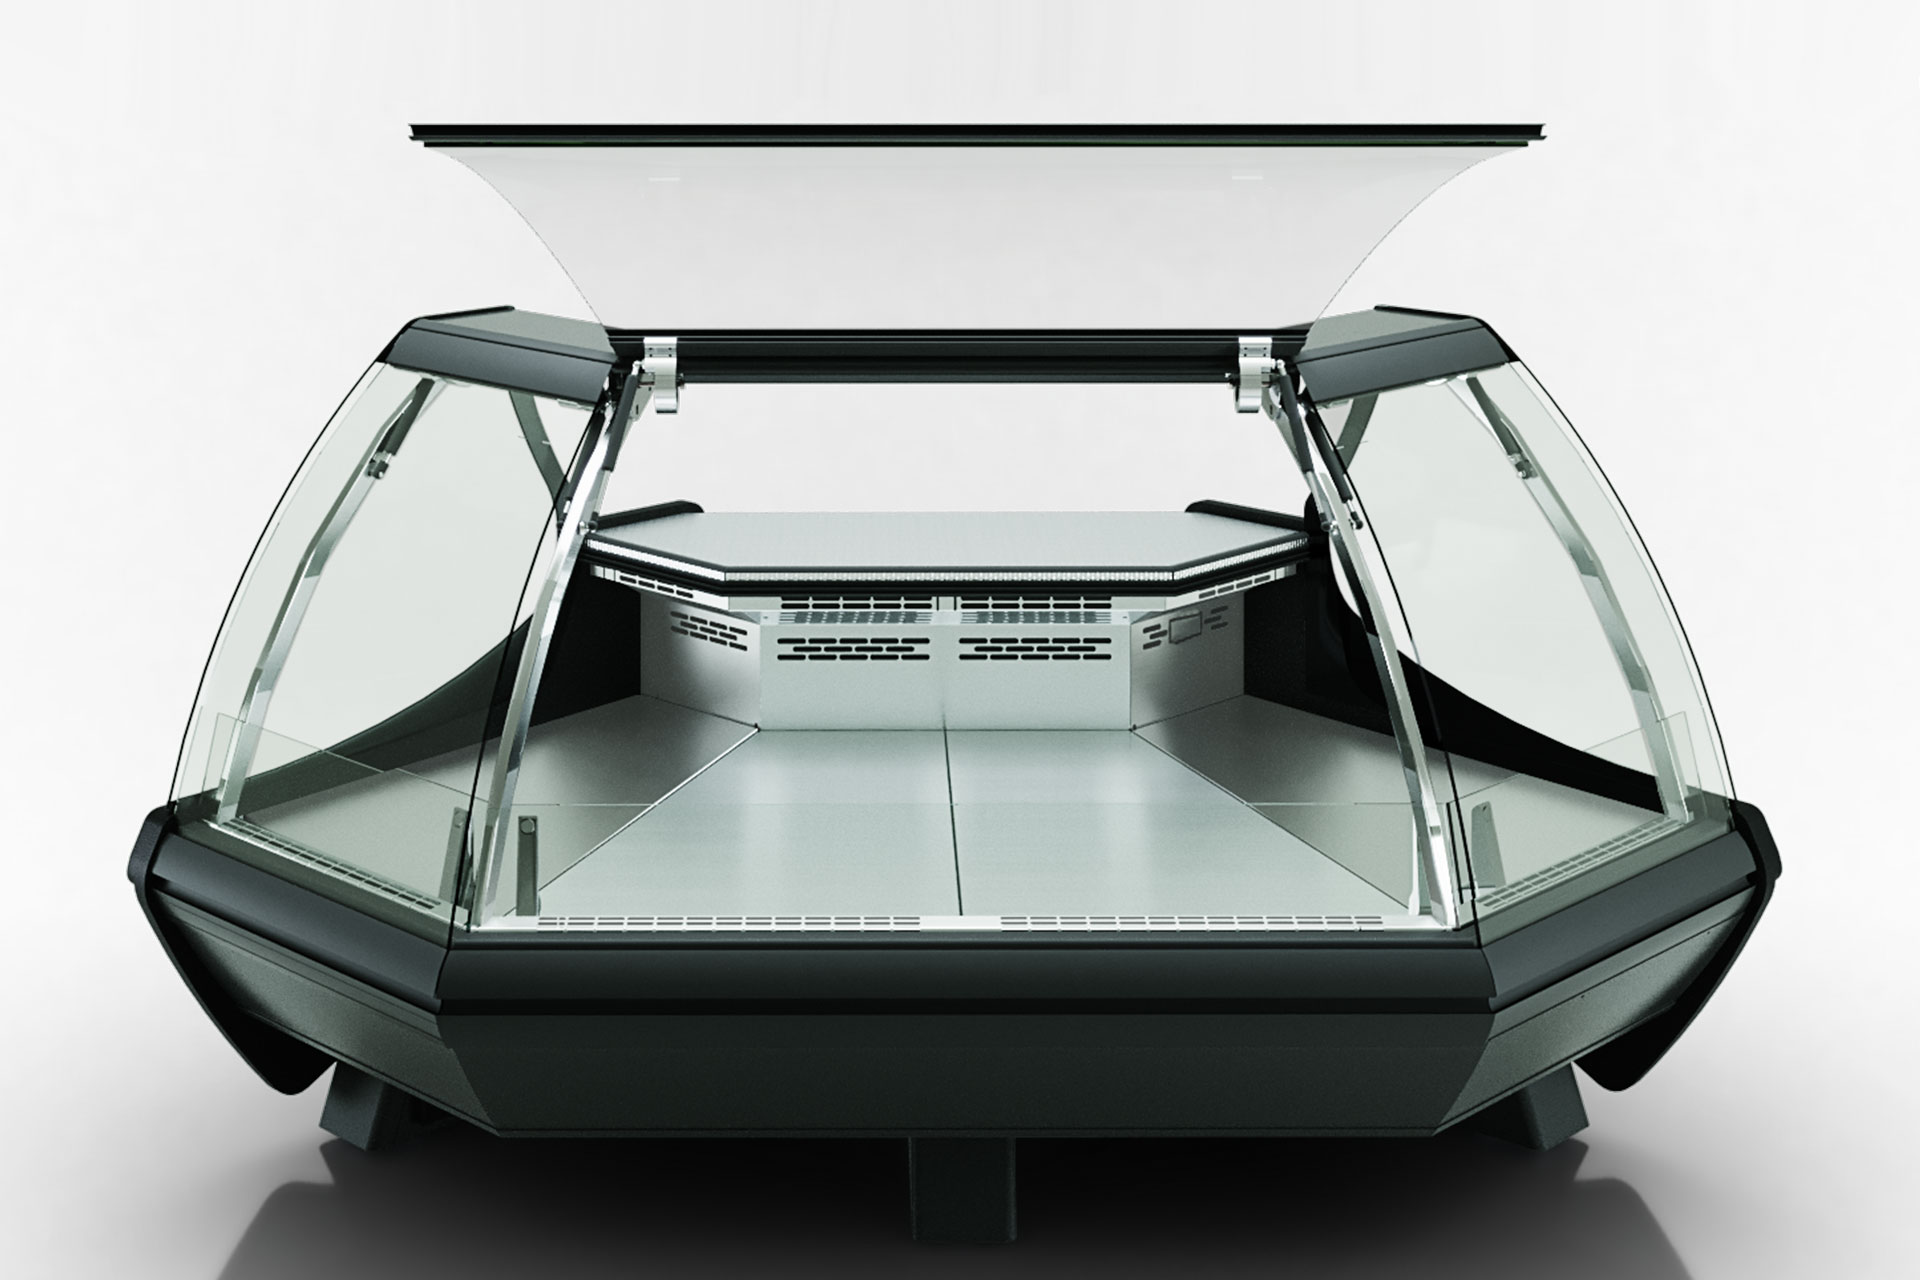 Вітрина Symphony luxe MG 100 deli PS 125-DLM-ES90